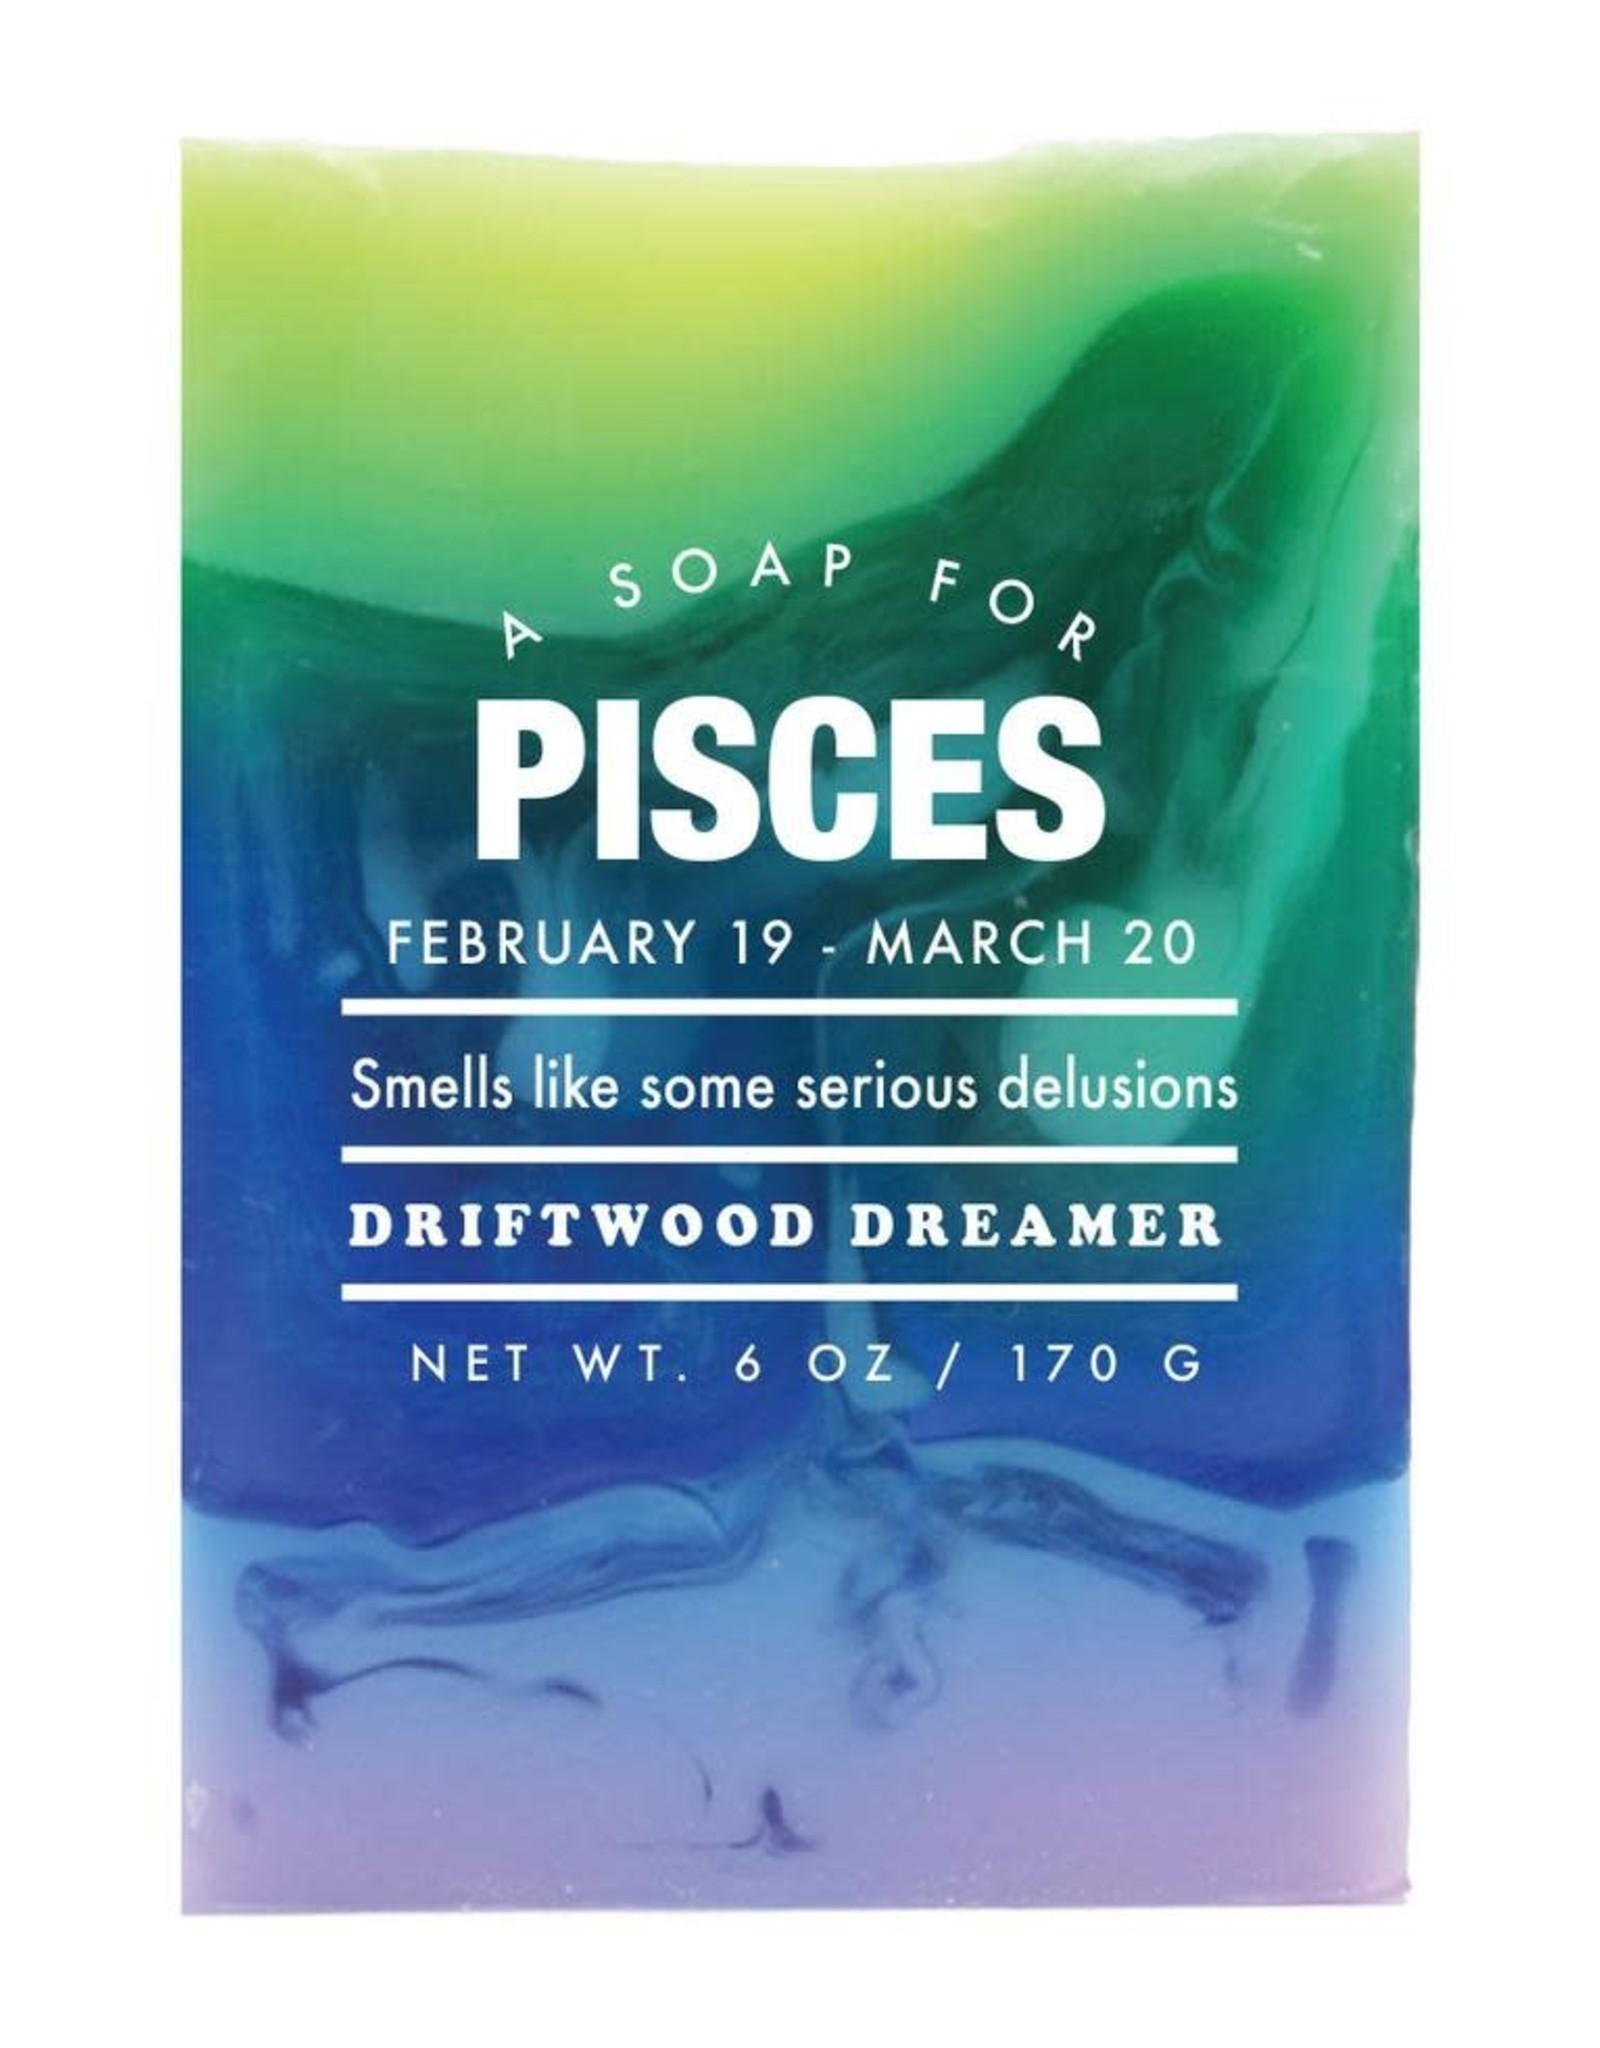 Whiskey River Soap WER - Soap/ Pisces 6 oz